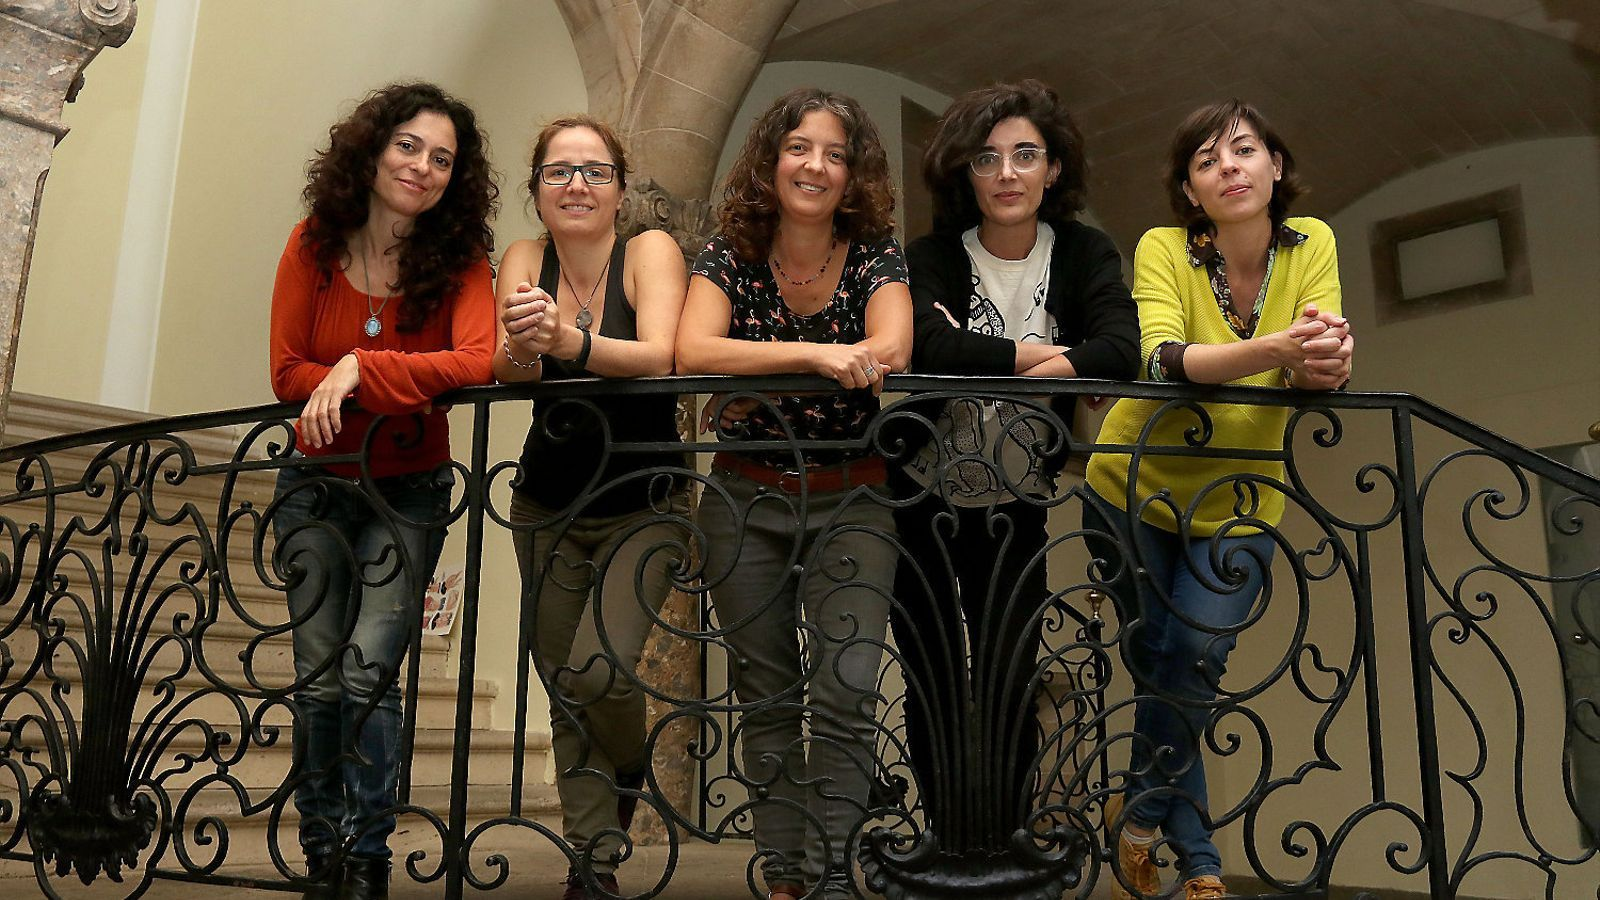 EL TERROR DE LES NENES  Marga Vinyes, Eva Barceló, Nívola Uyá, Enriqueta Llorca i Flavia Gargiulo.